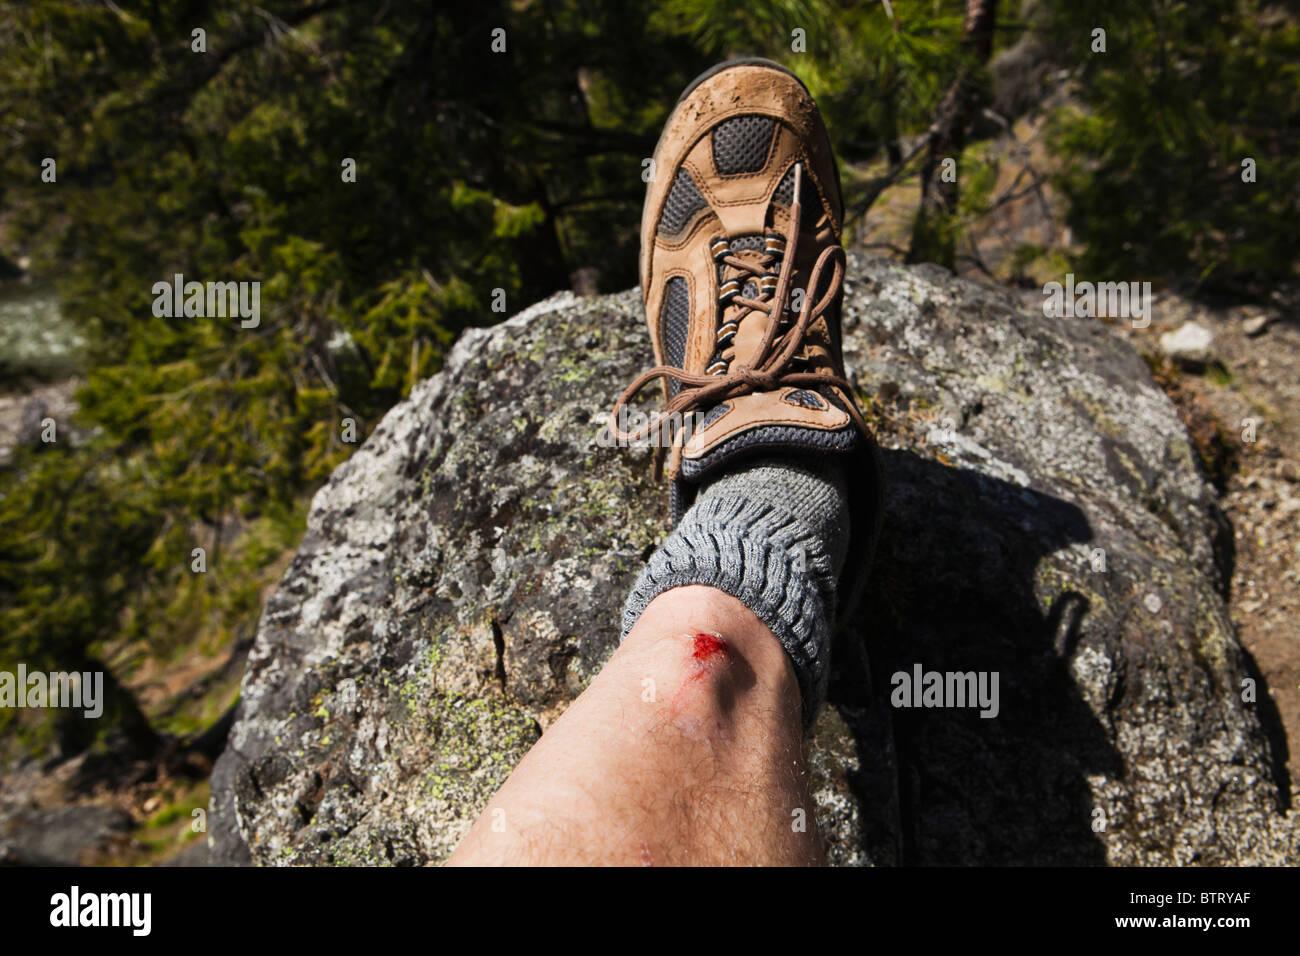 A mans leg with a bleeding contusion on his shin. - Stock Image